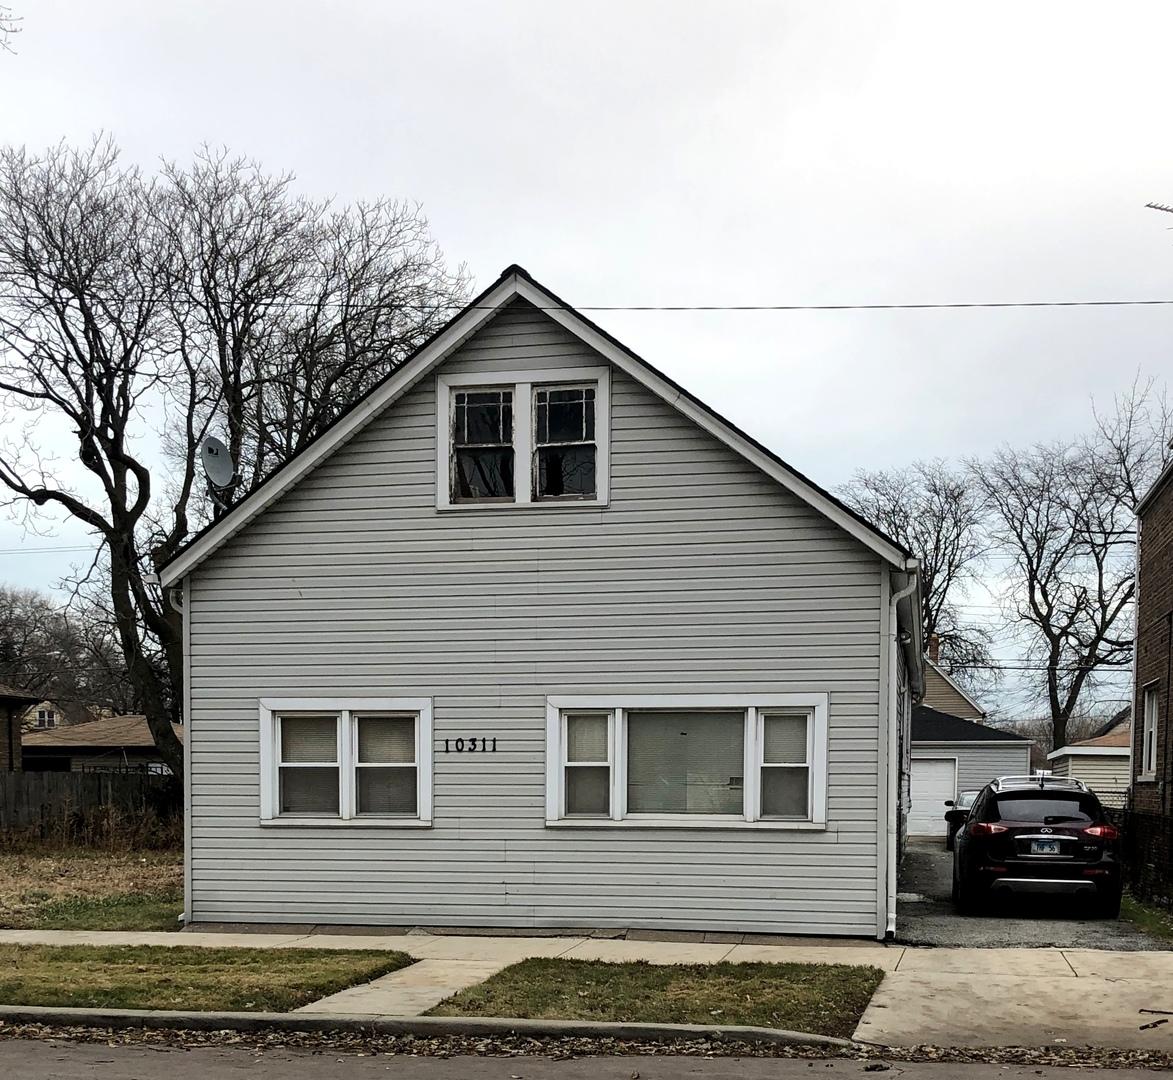 10311 S Calhoun Exterior Photo